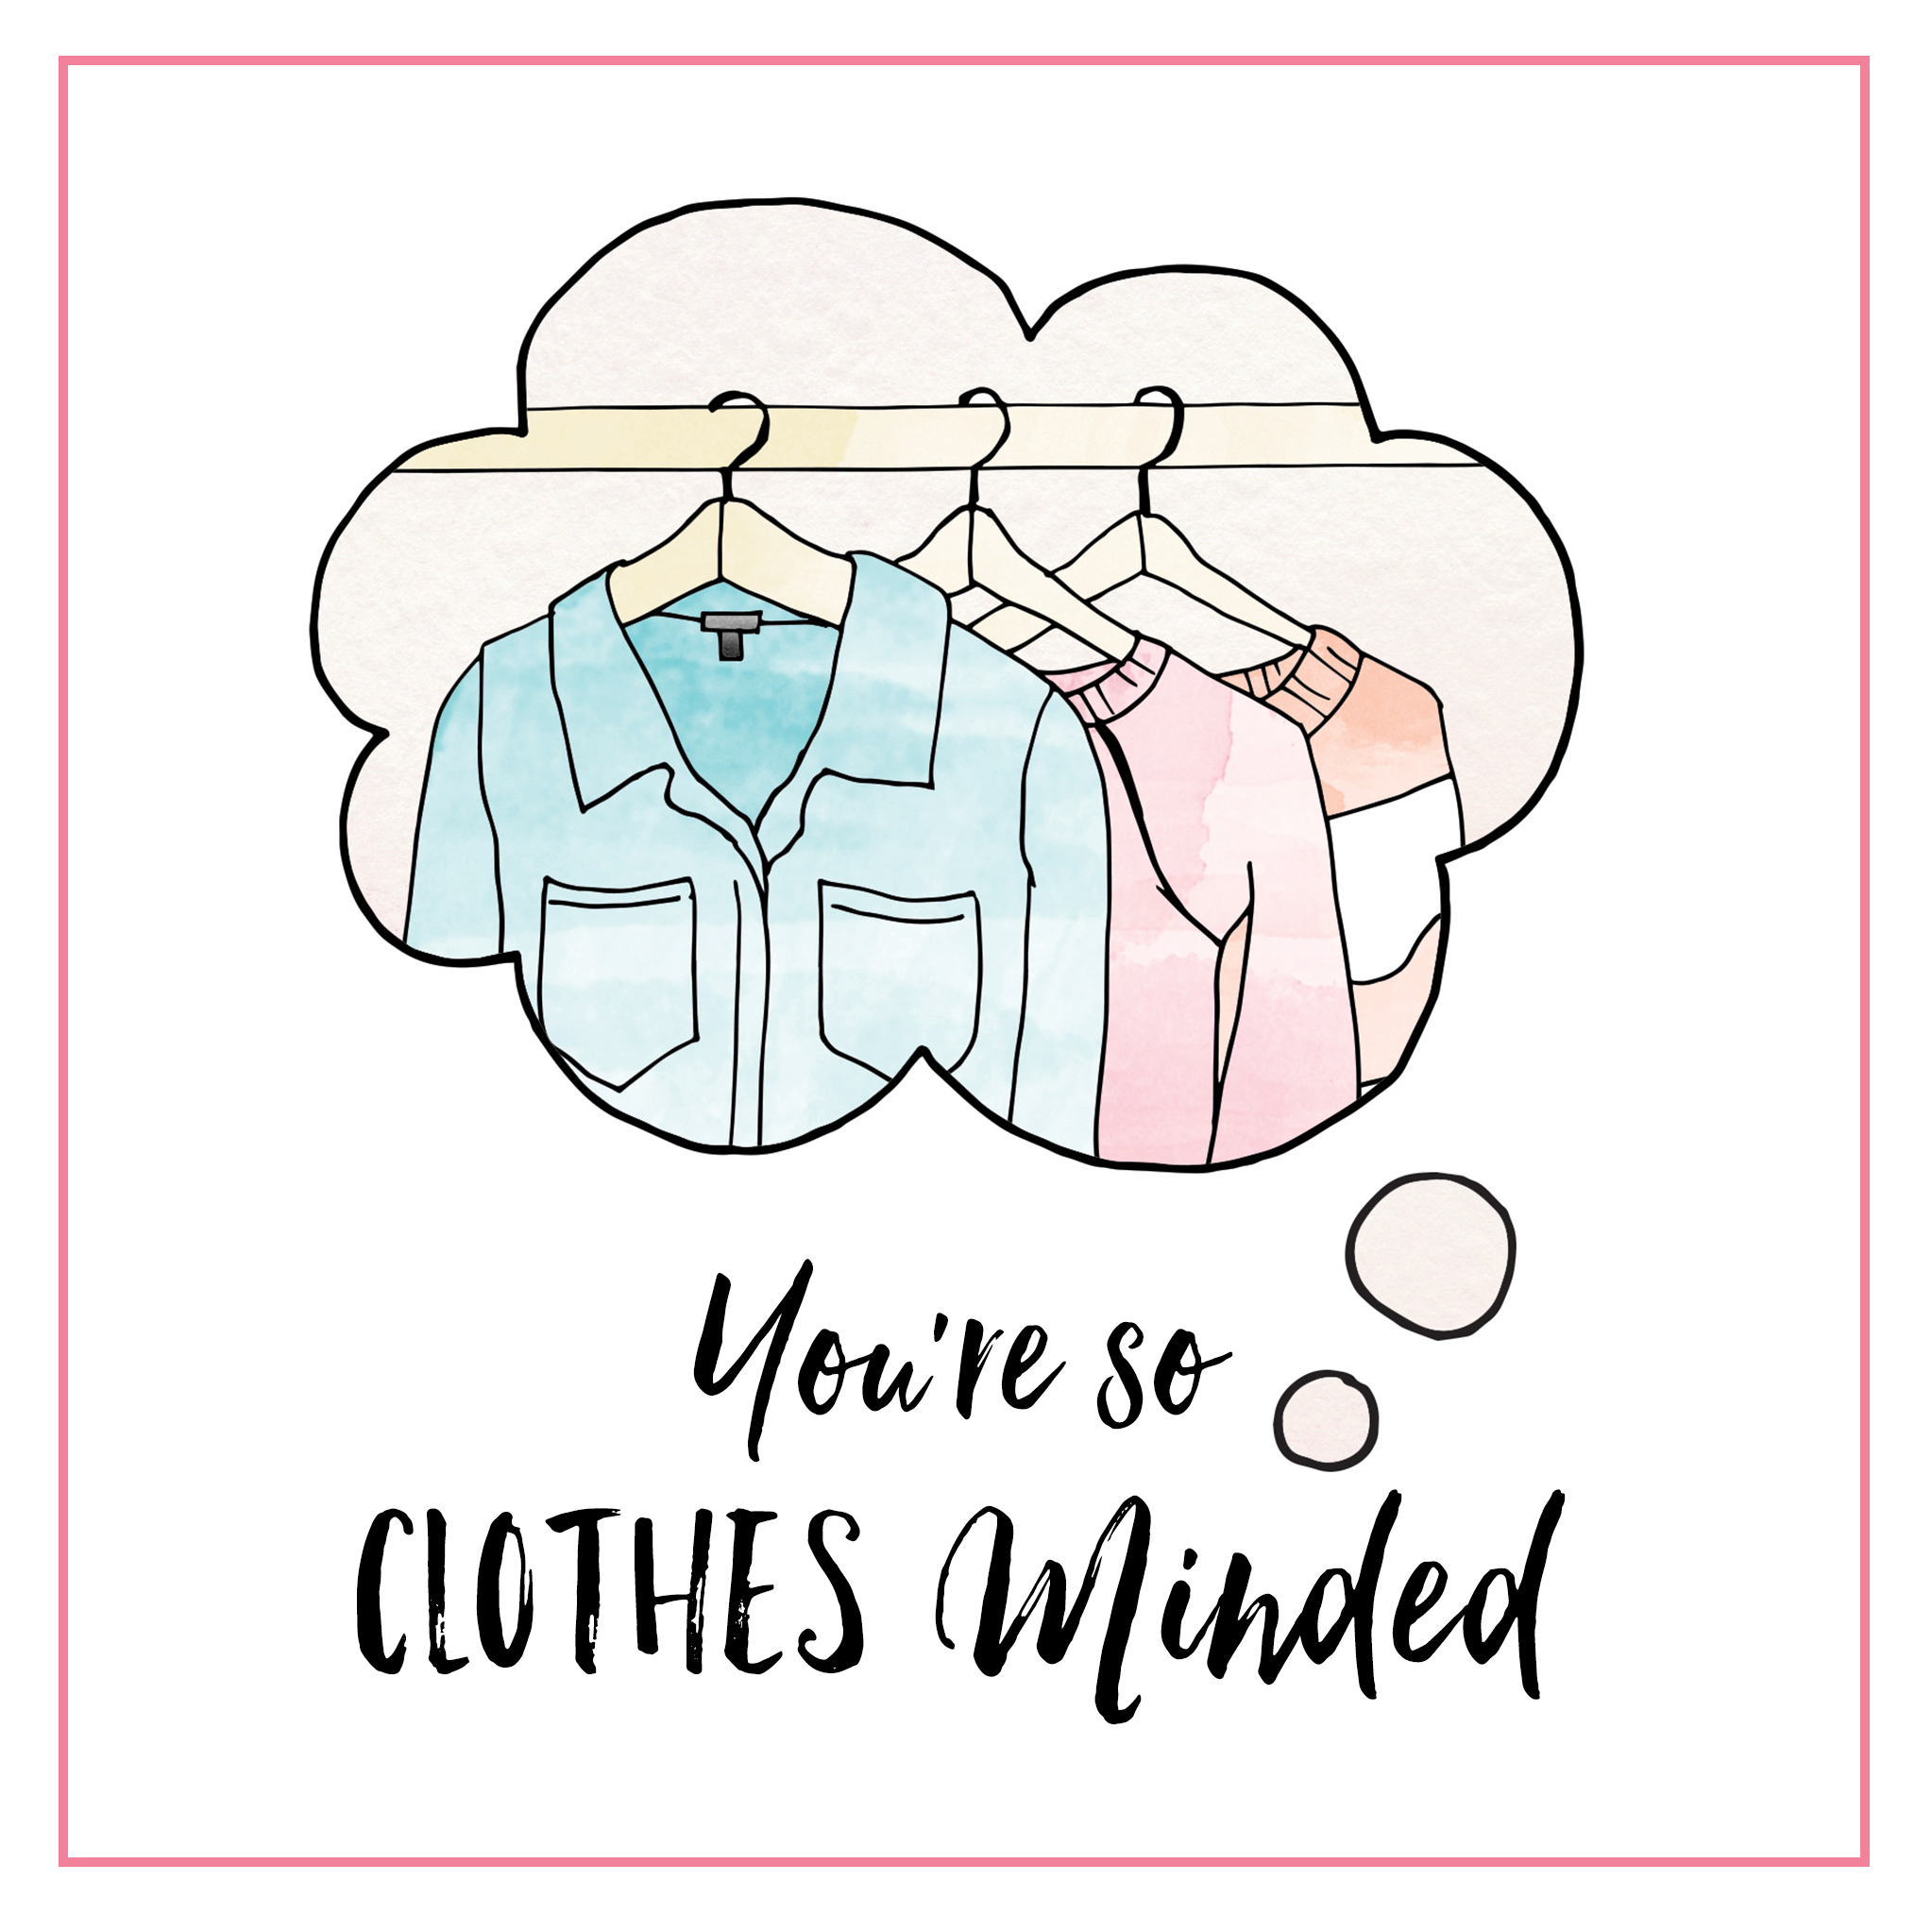 vDay_organicSocial_clothesMinded.jpg